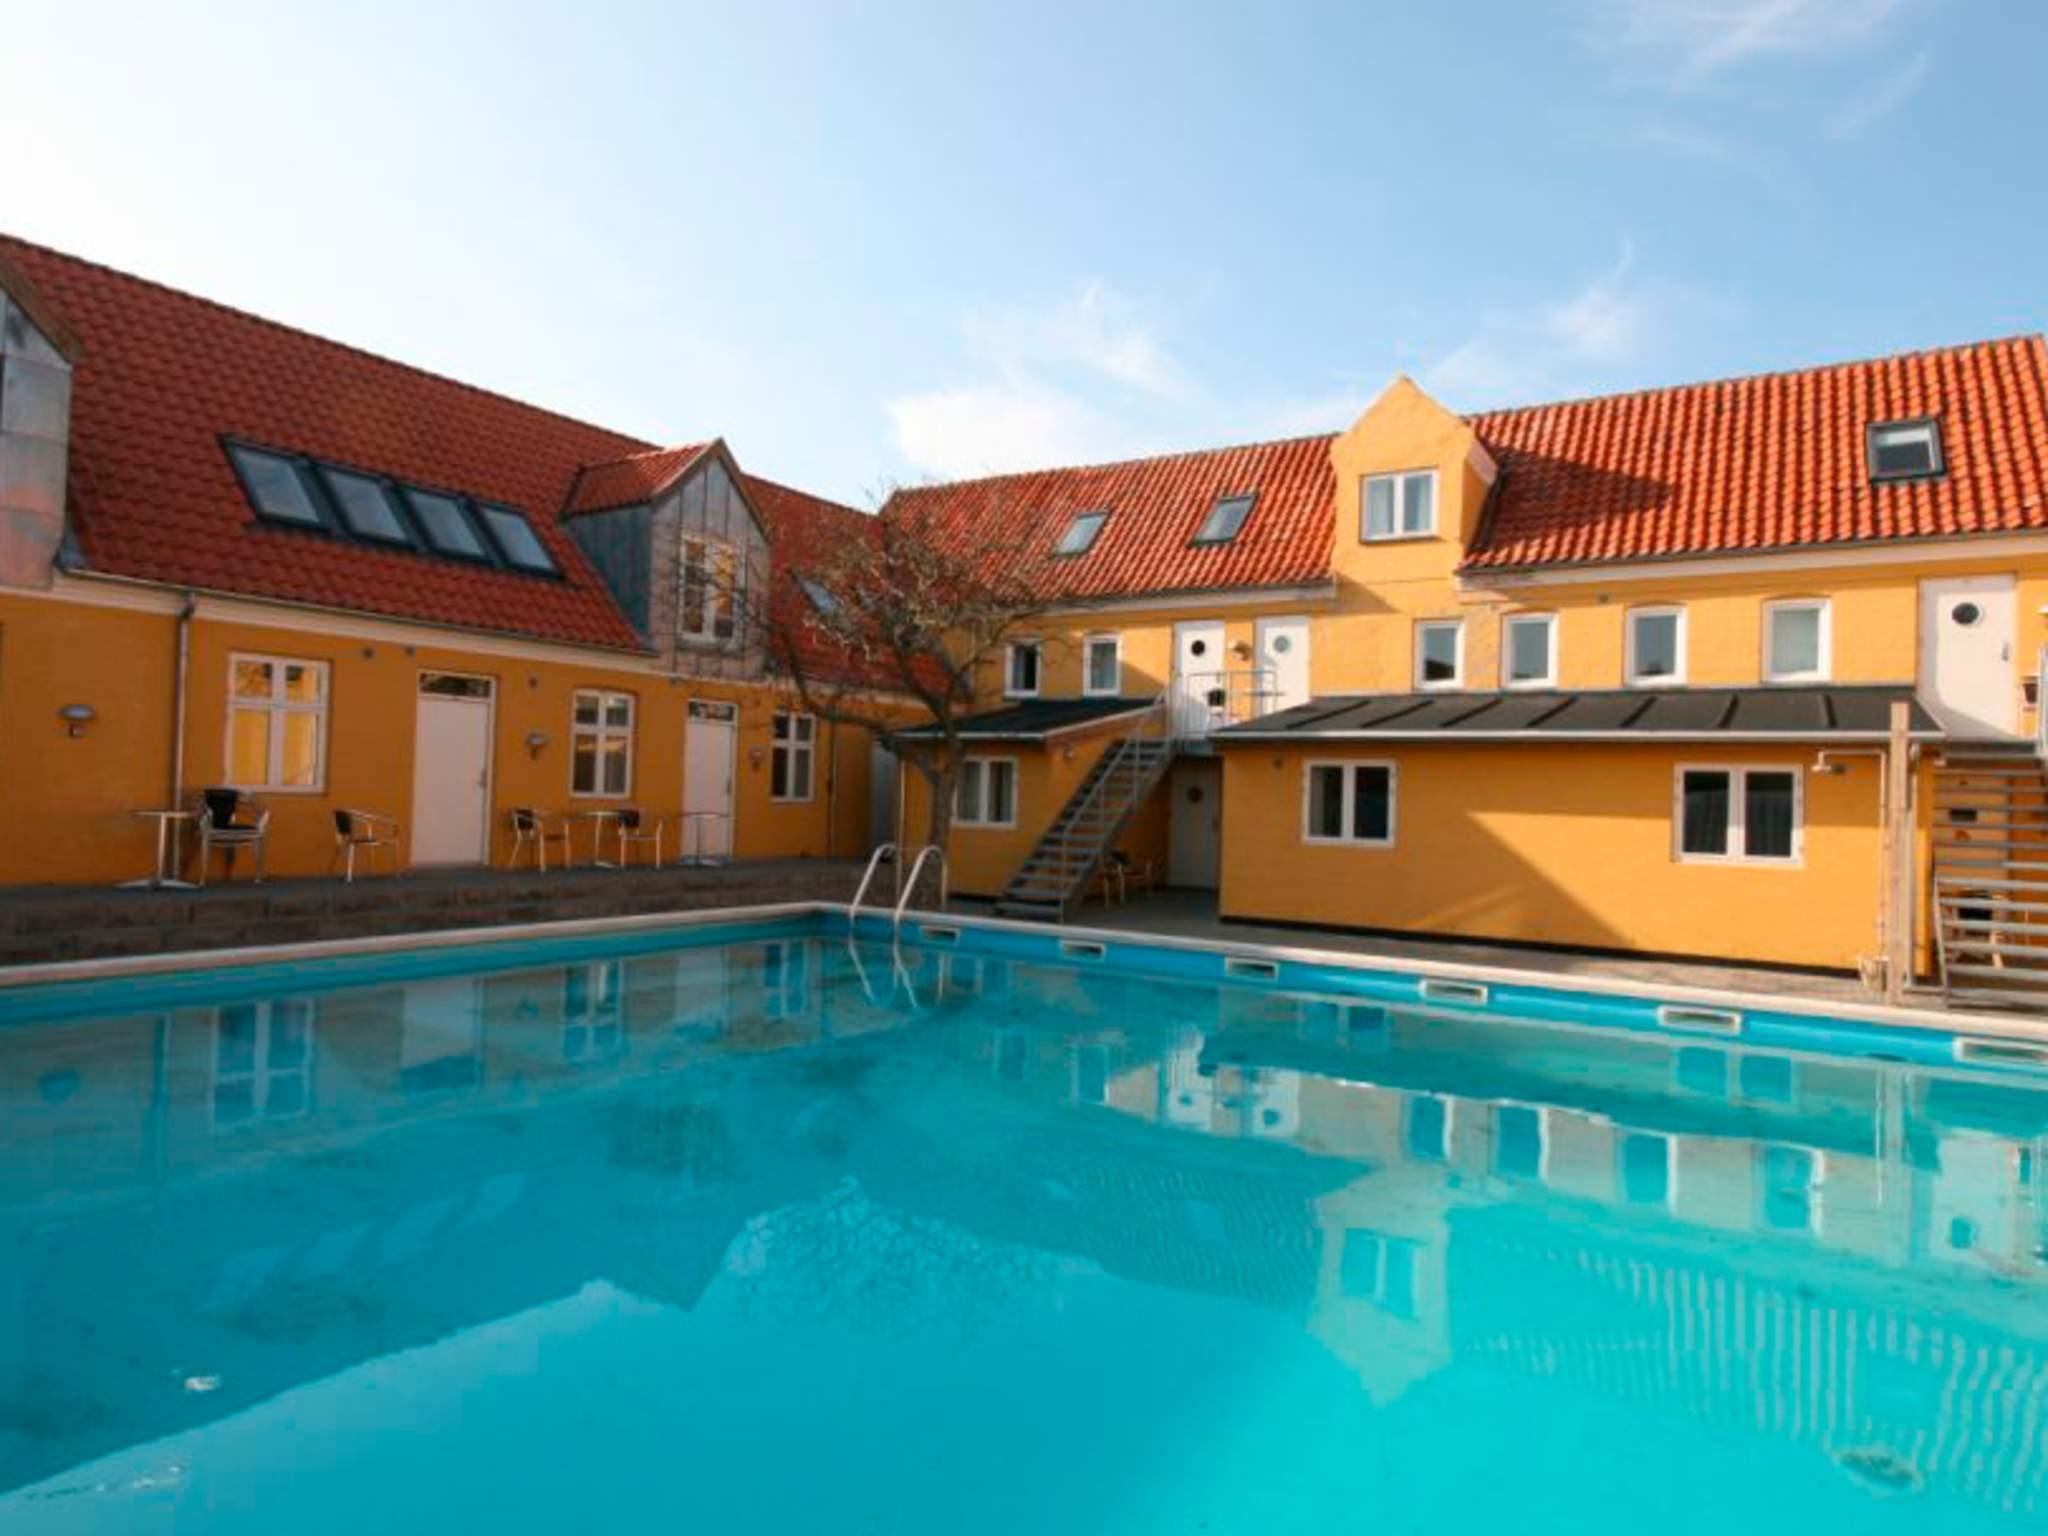 Ferienwohnung Gudhjem (135425), Gudhjem, , Bornholm, Dänemark, Bild 1